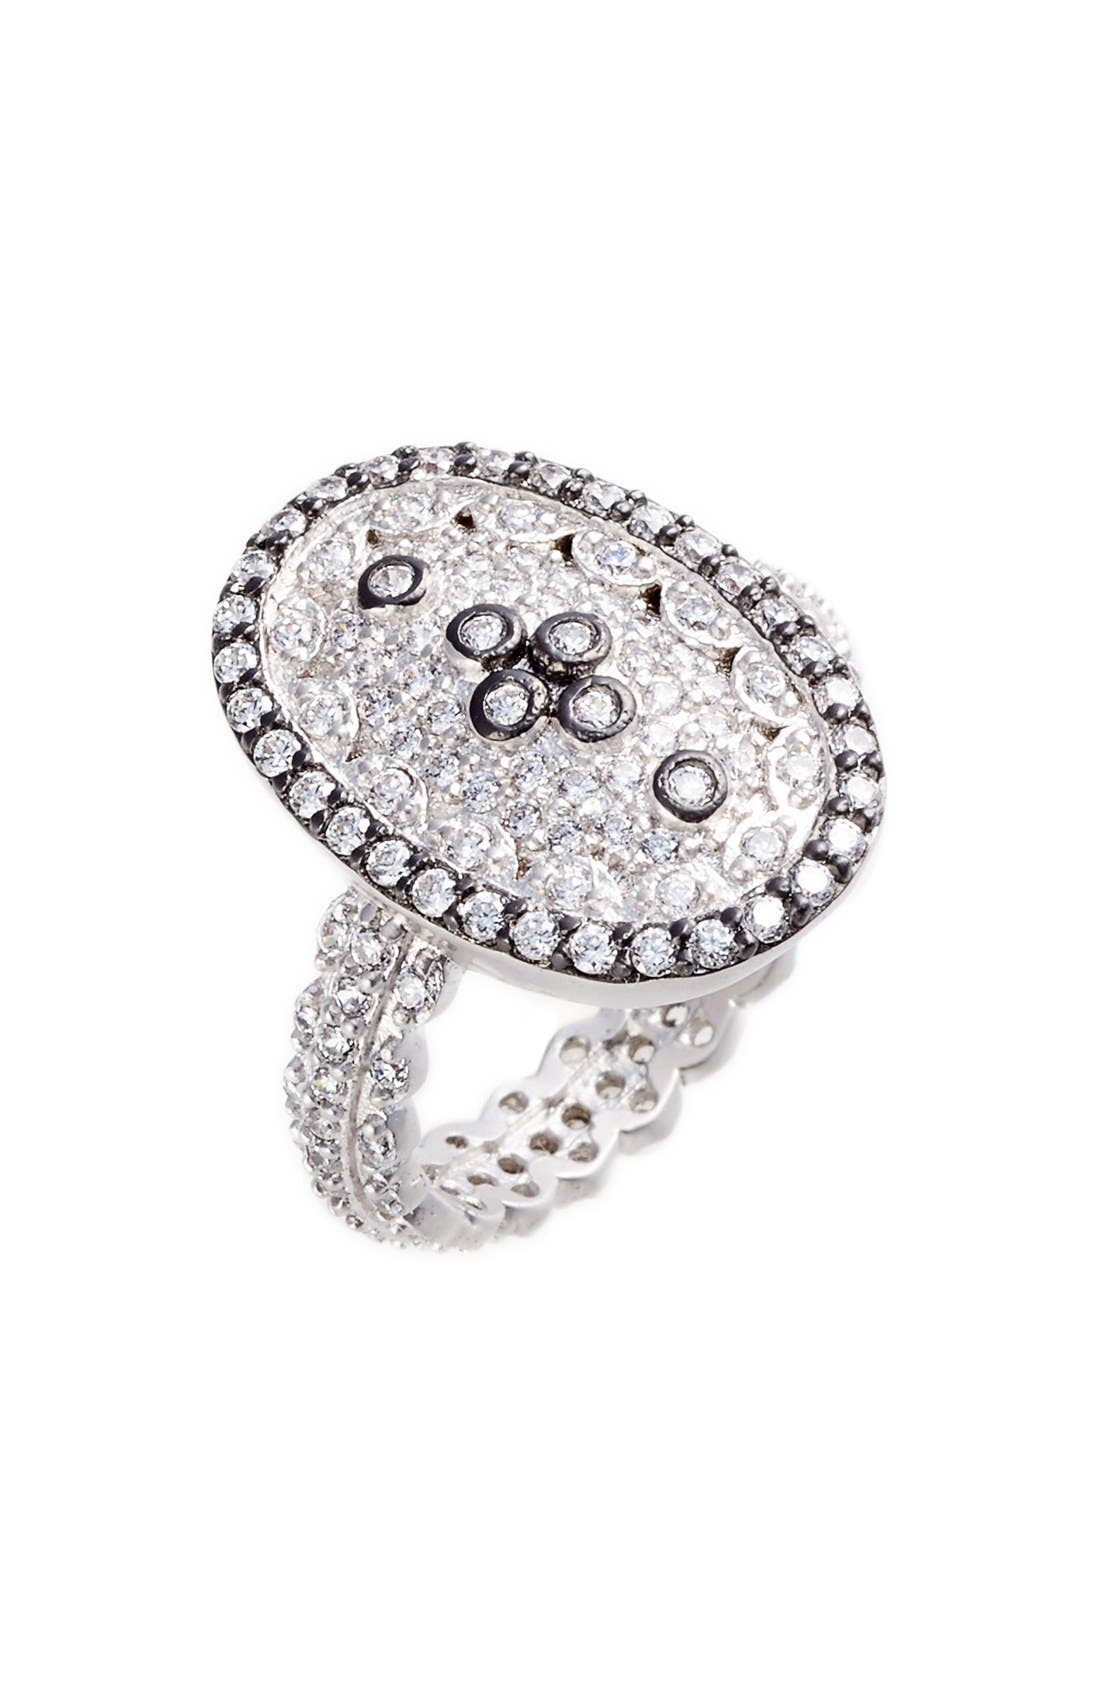 FREIDA ROTHMAN Pavé Cubic Zirconia Clover Ring